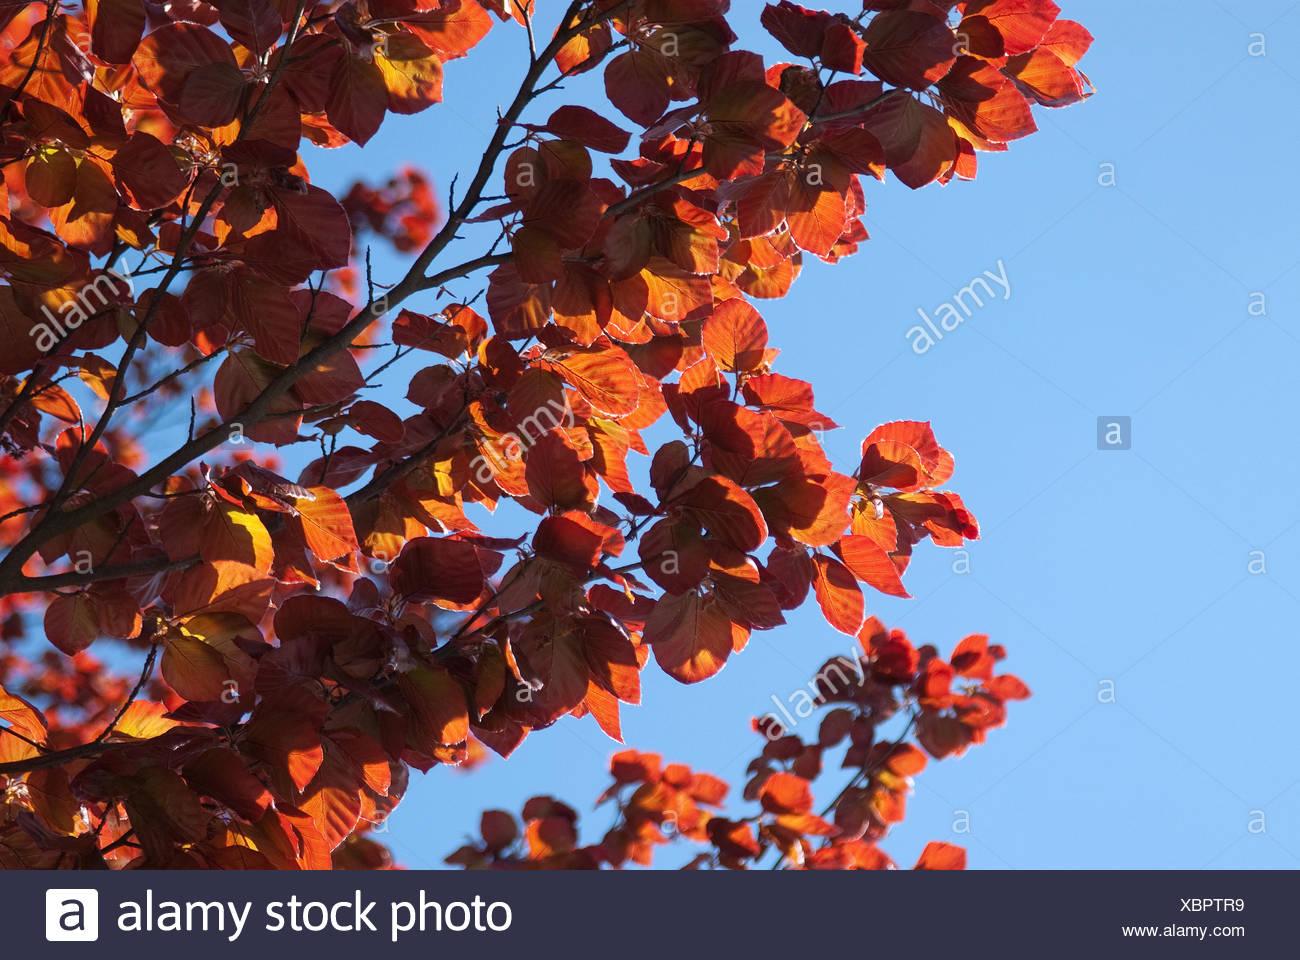 copper beech (Fagus sylvatica 'Purpurea Latifolia', Fagus sylvatica Purpurea Latifolia), cultivar Purpurea Latifolia, branch against blue sky - Stock Image